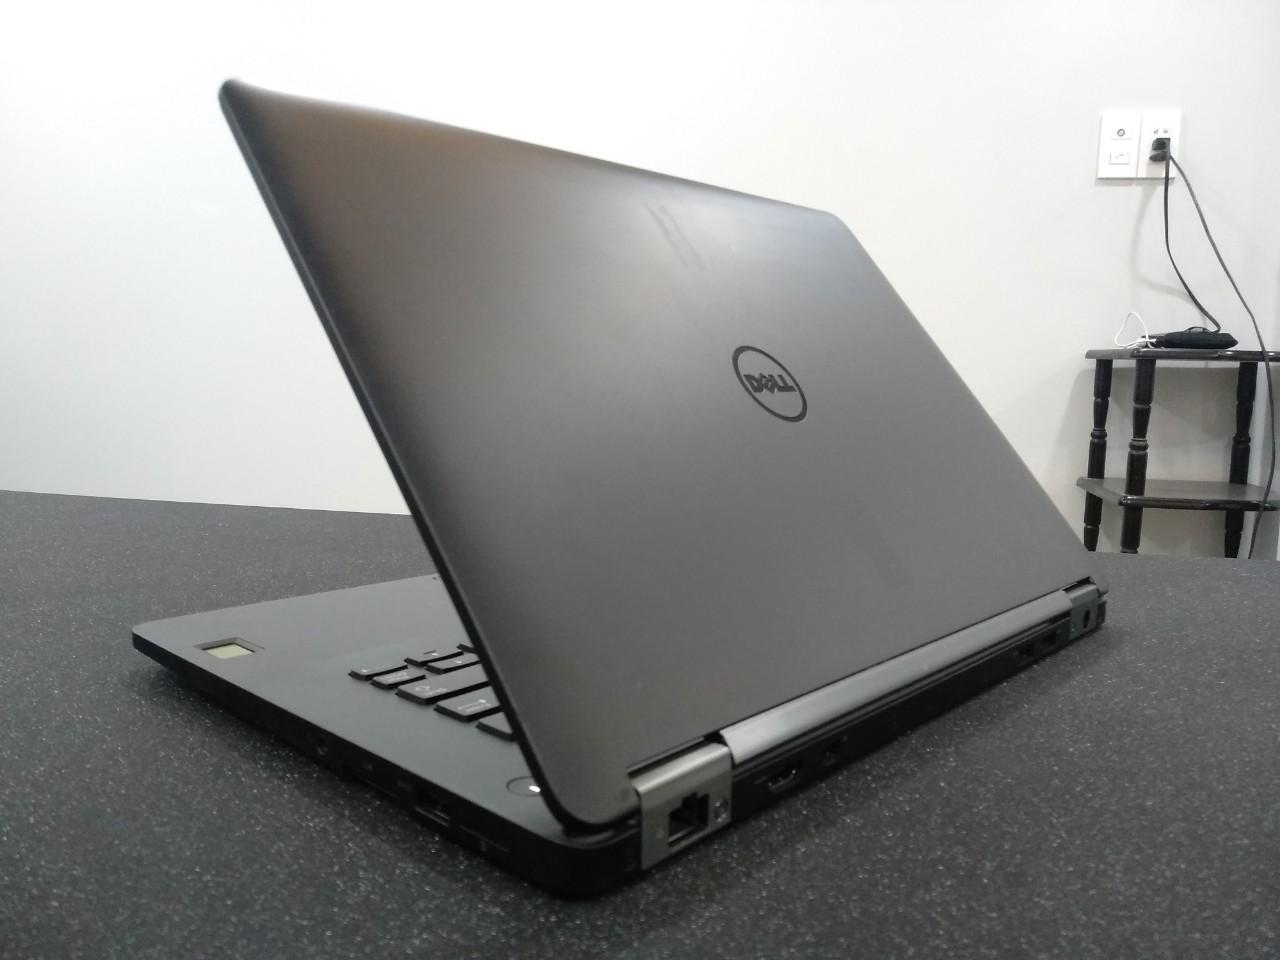 Dell Latidude 7470 (Core i7, Ram 8GB, SSD 256GB, Màn hình 14 inch FHD)